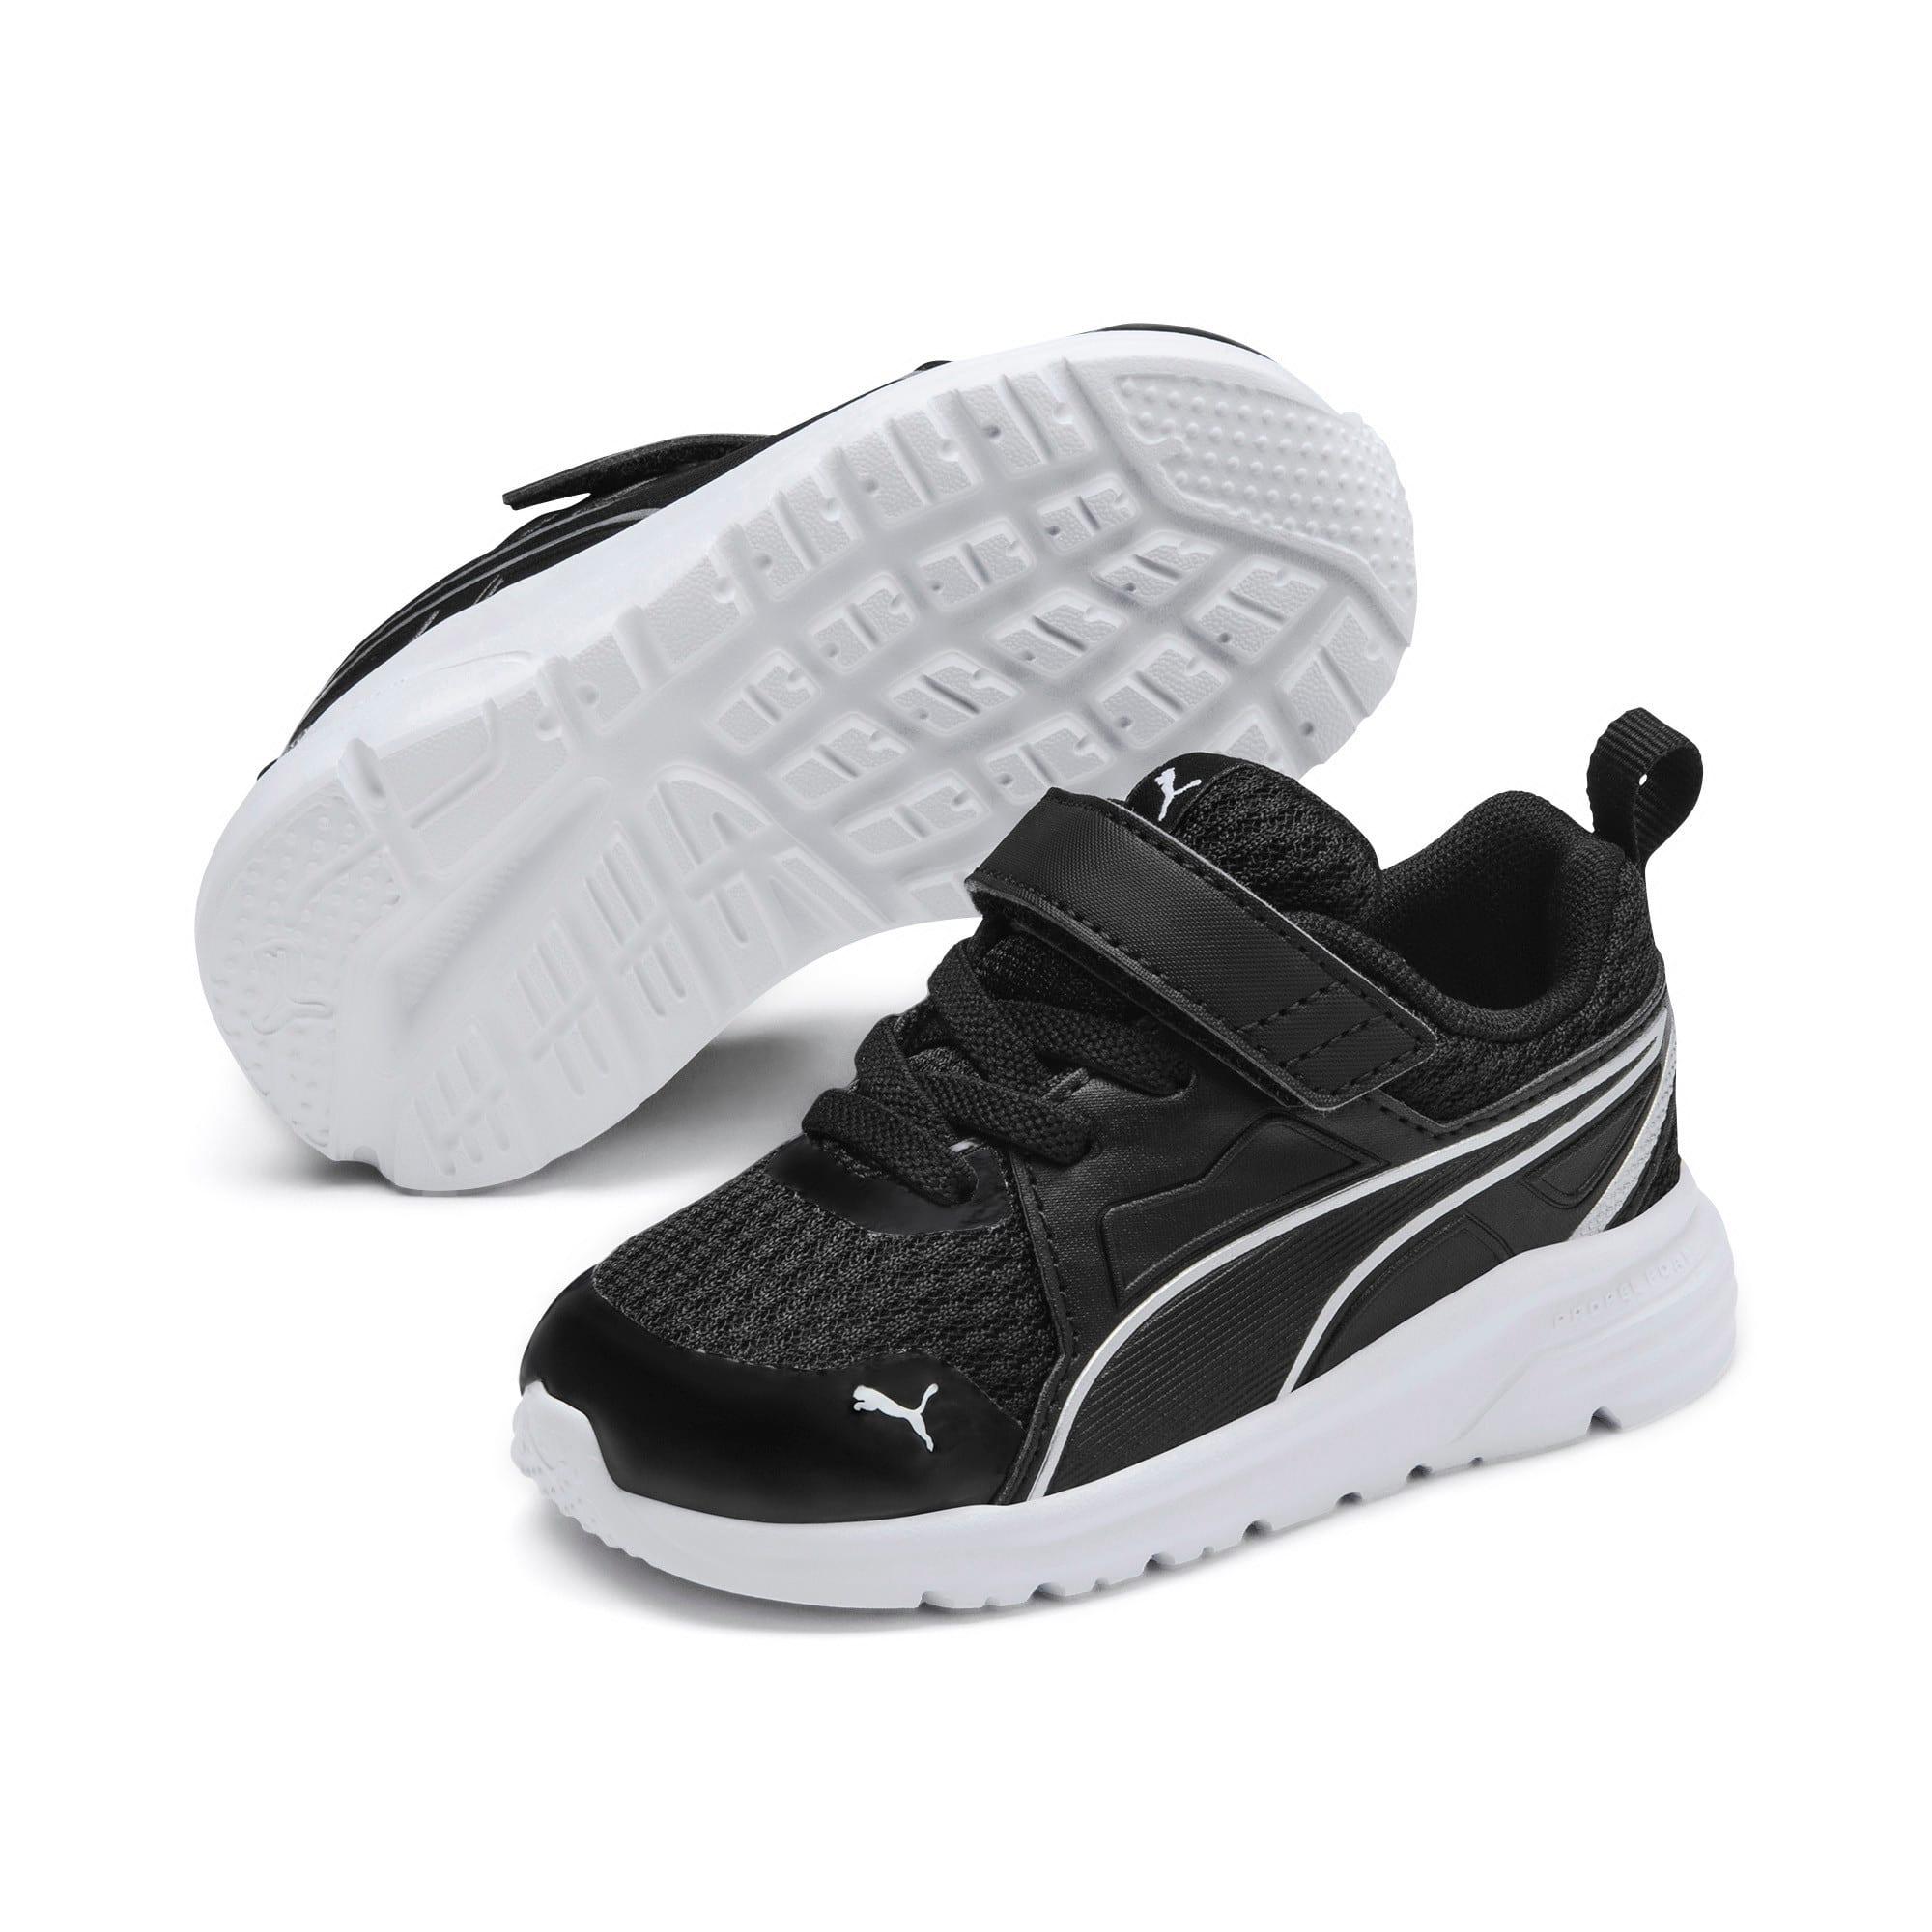 Thumbnail 2 of Pure Jogger Babies Sneaker, Black-Silver-Wht-Nrgy Yellow, medium